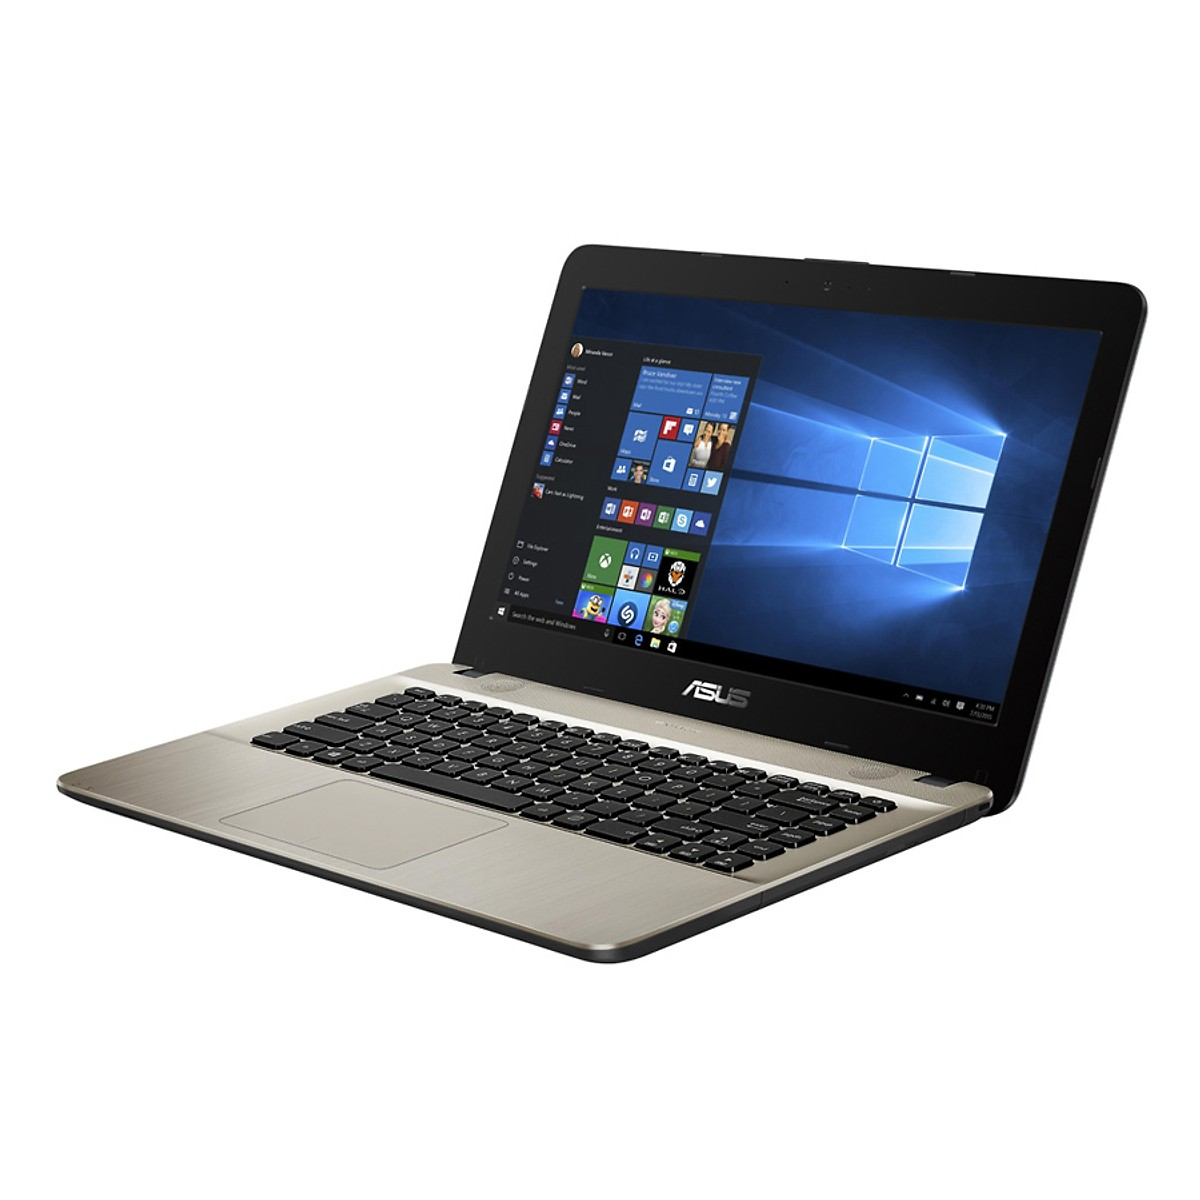 Asus   Máy tính xách tay - Laptop    Laptop ASUS VivoBook 14 X441UA-WX427T Core i3-6006U/ Win10 (14